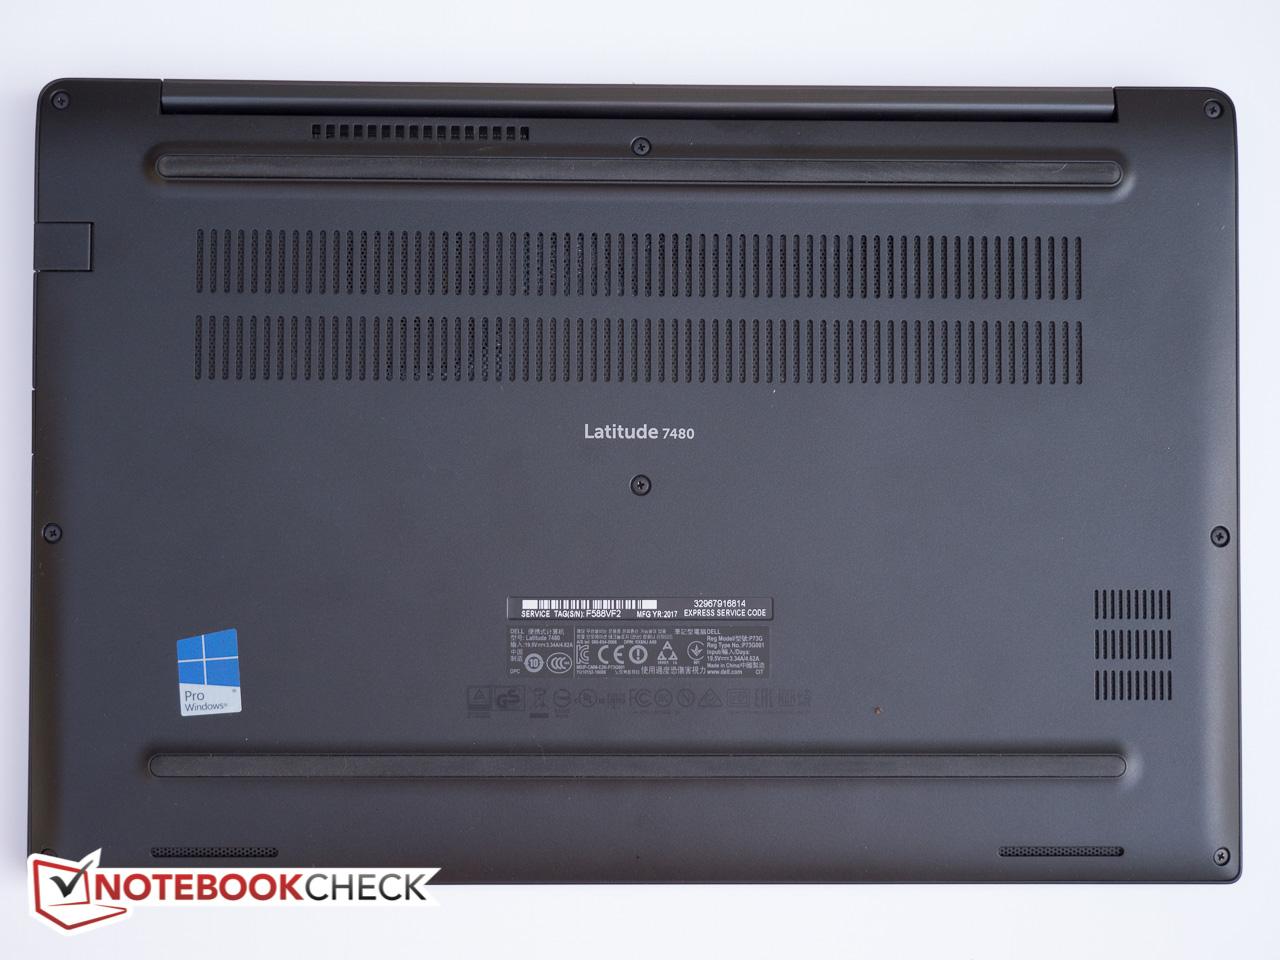 Dell Latitude 7480 (7600U, FHD) Laptop Review - NotebookCheck net